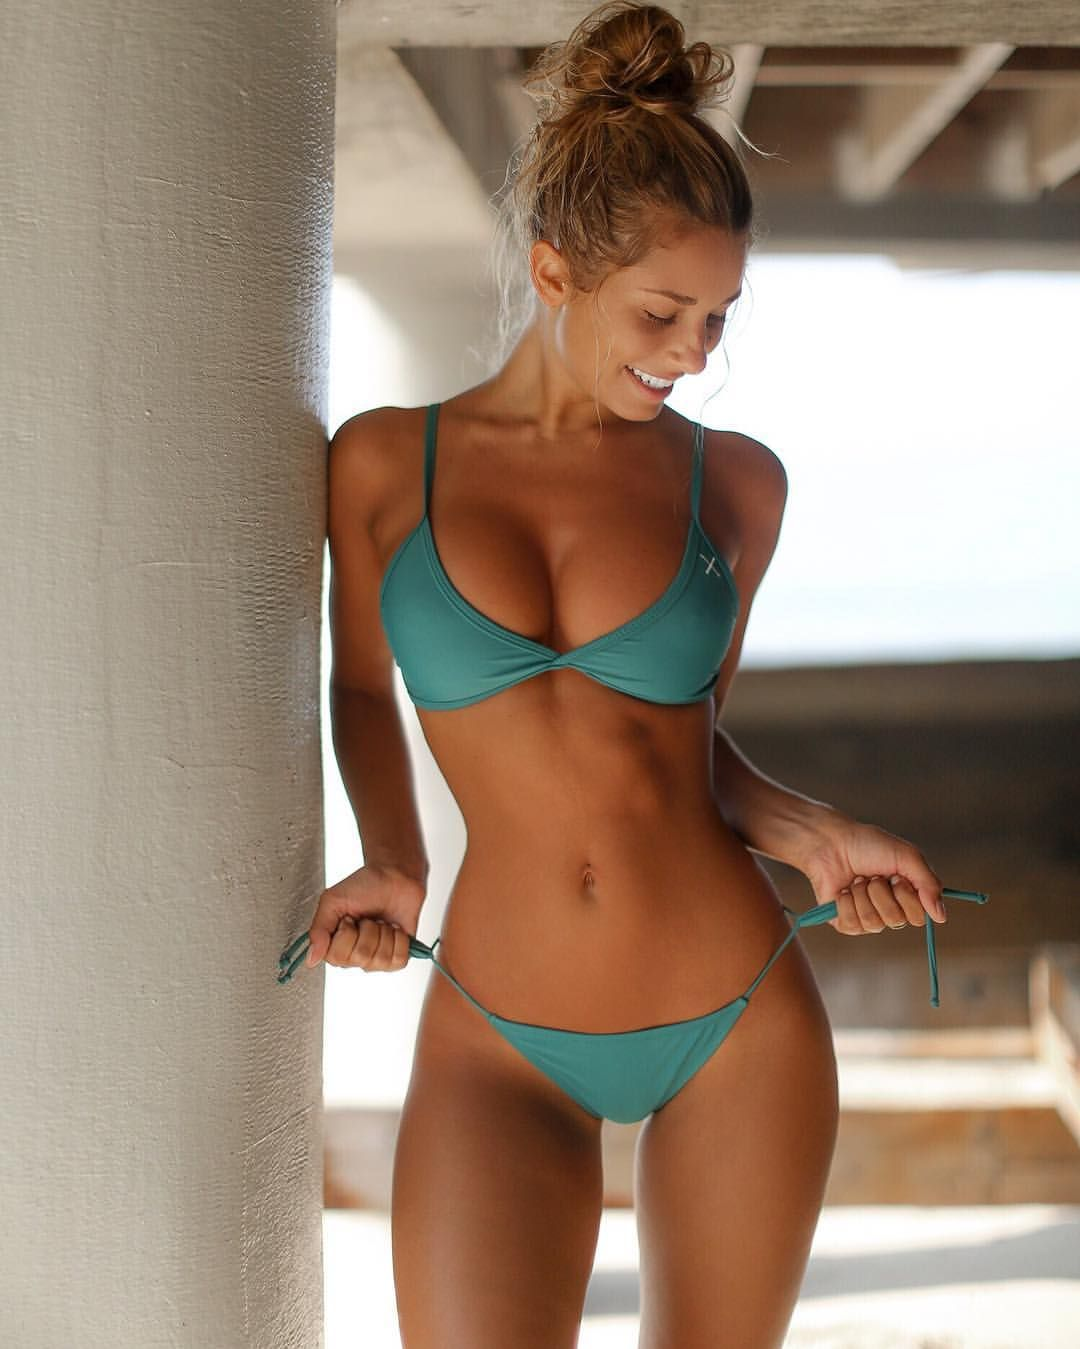 Pics wenn nackt sexy Mädchen